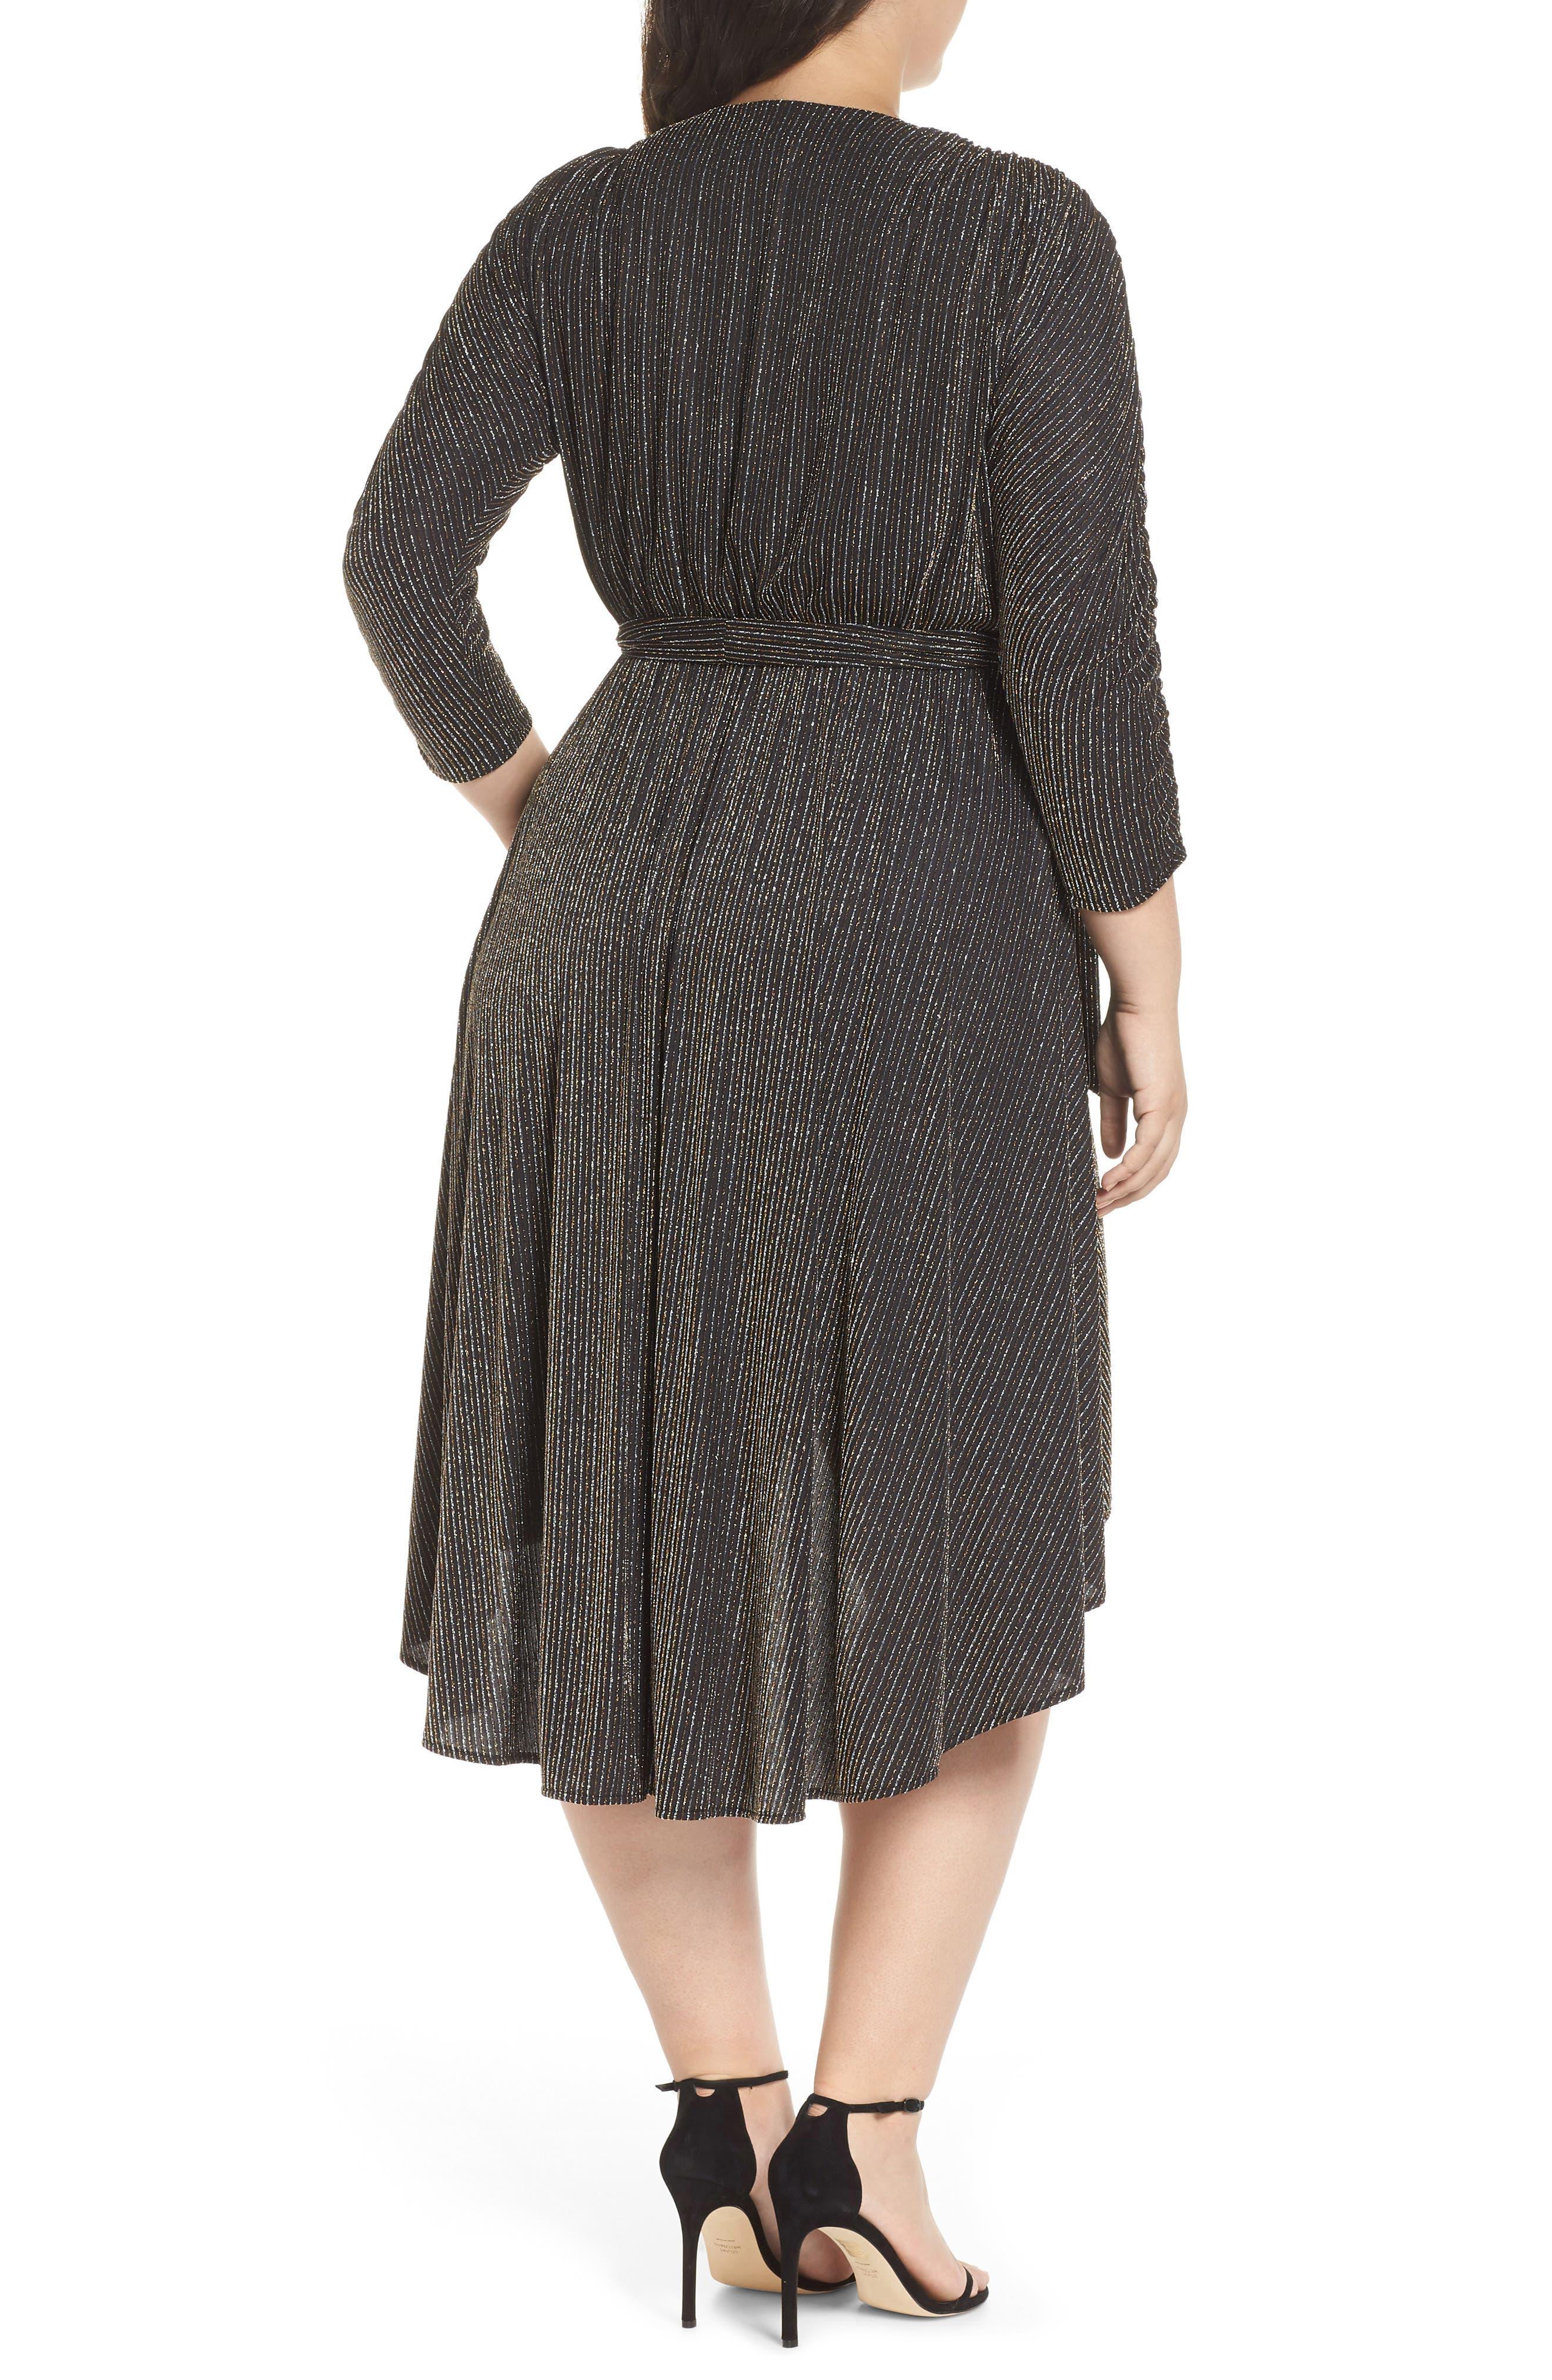 CHELSEA28,                             Metallic Tie Waist Dress,                             Alternate thumbnail 2, color,                             001